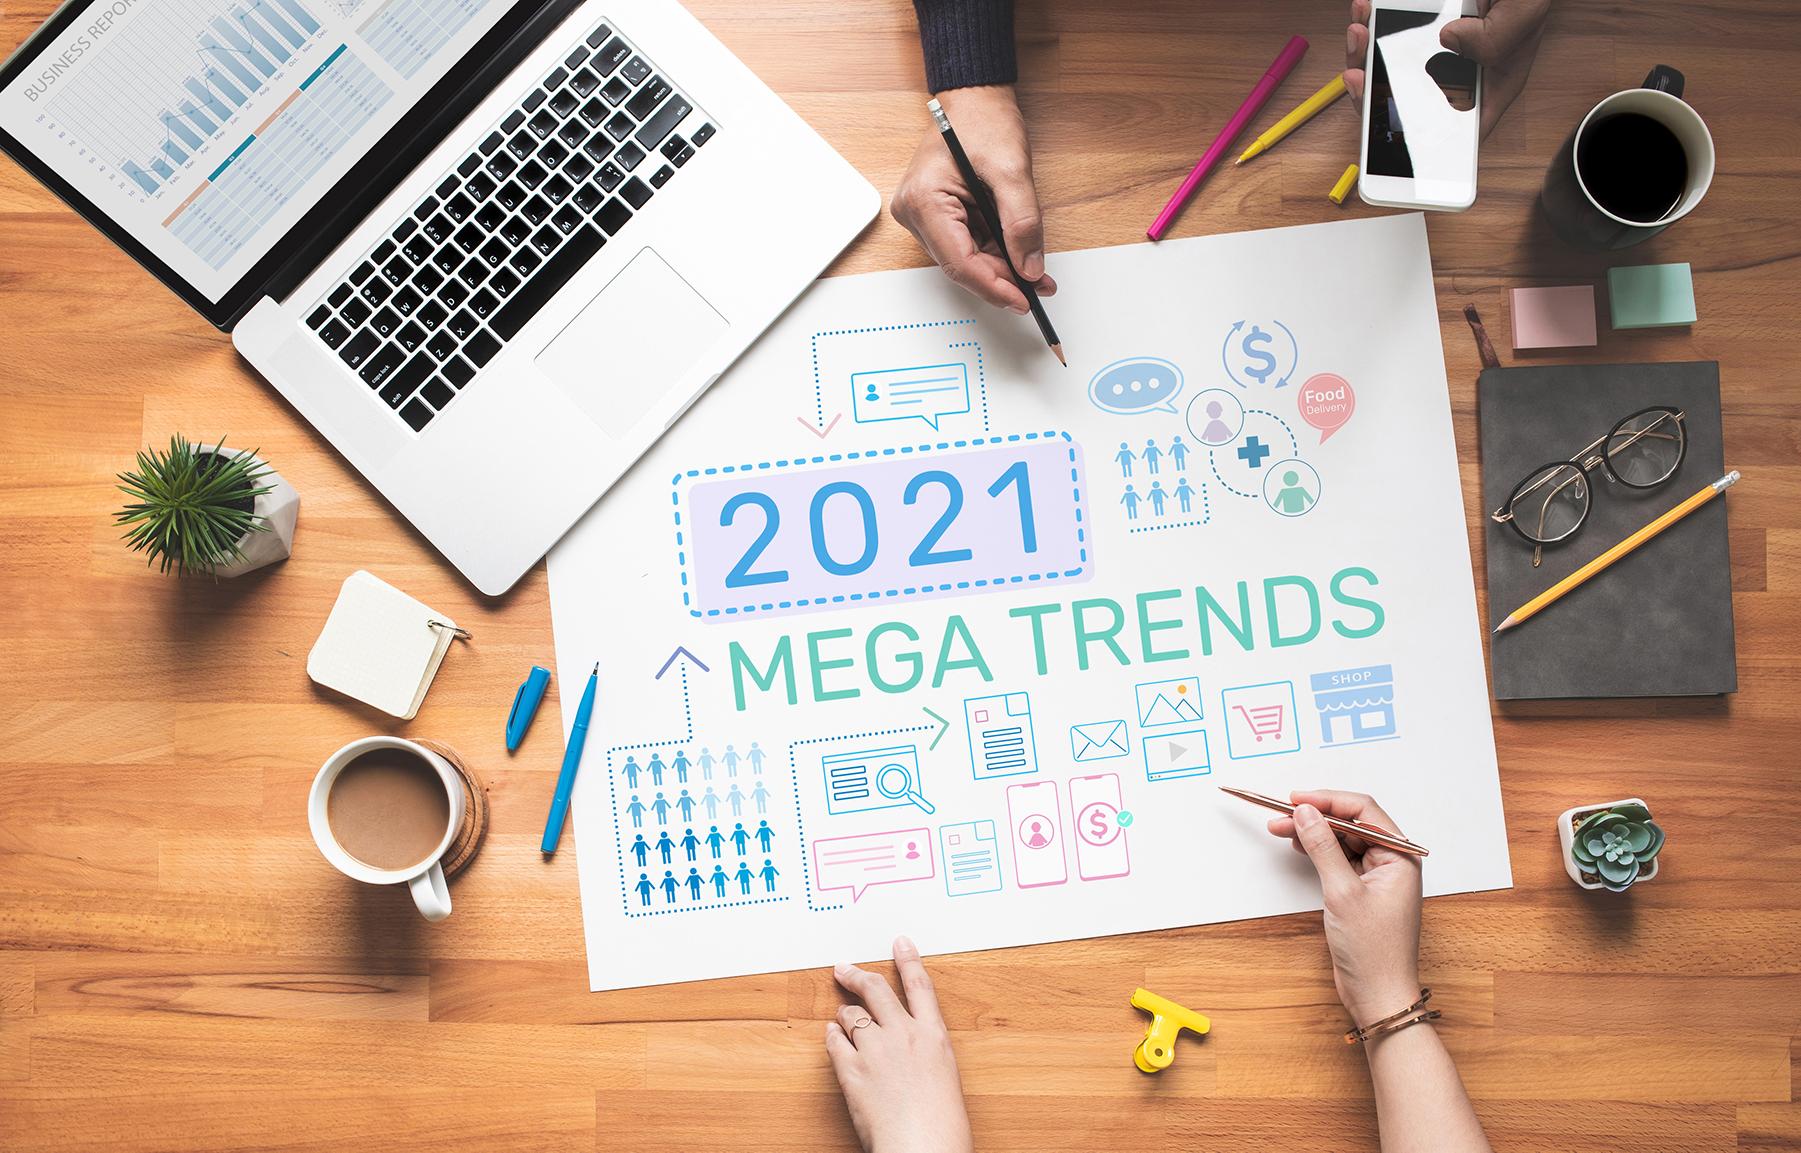 Datengestützes Marketing Trends 2021